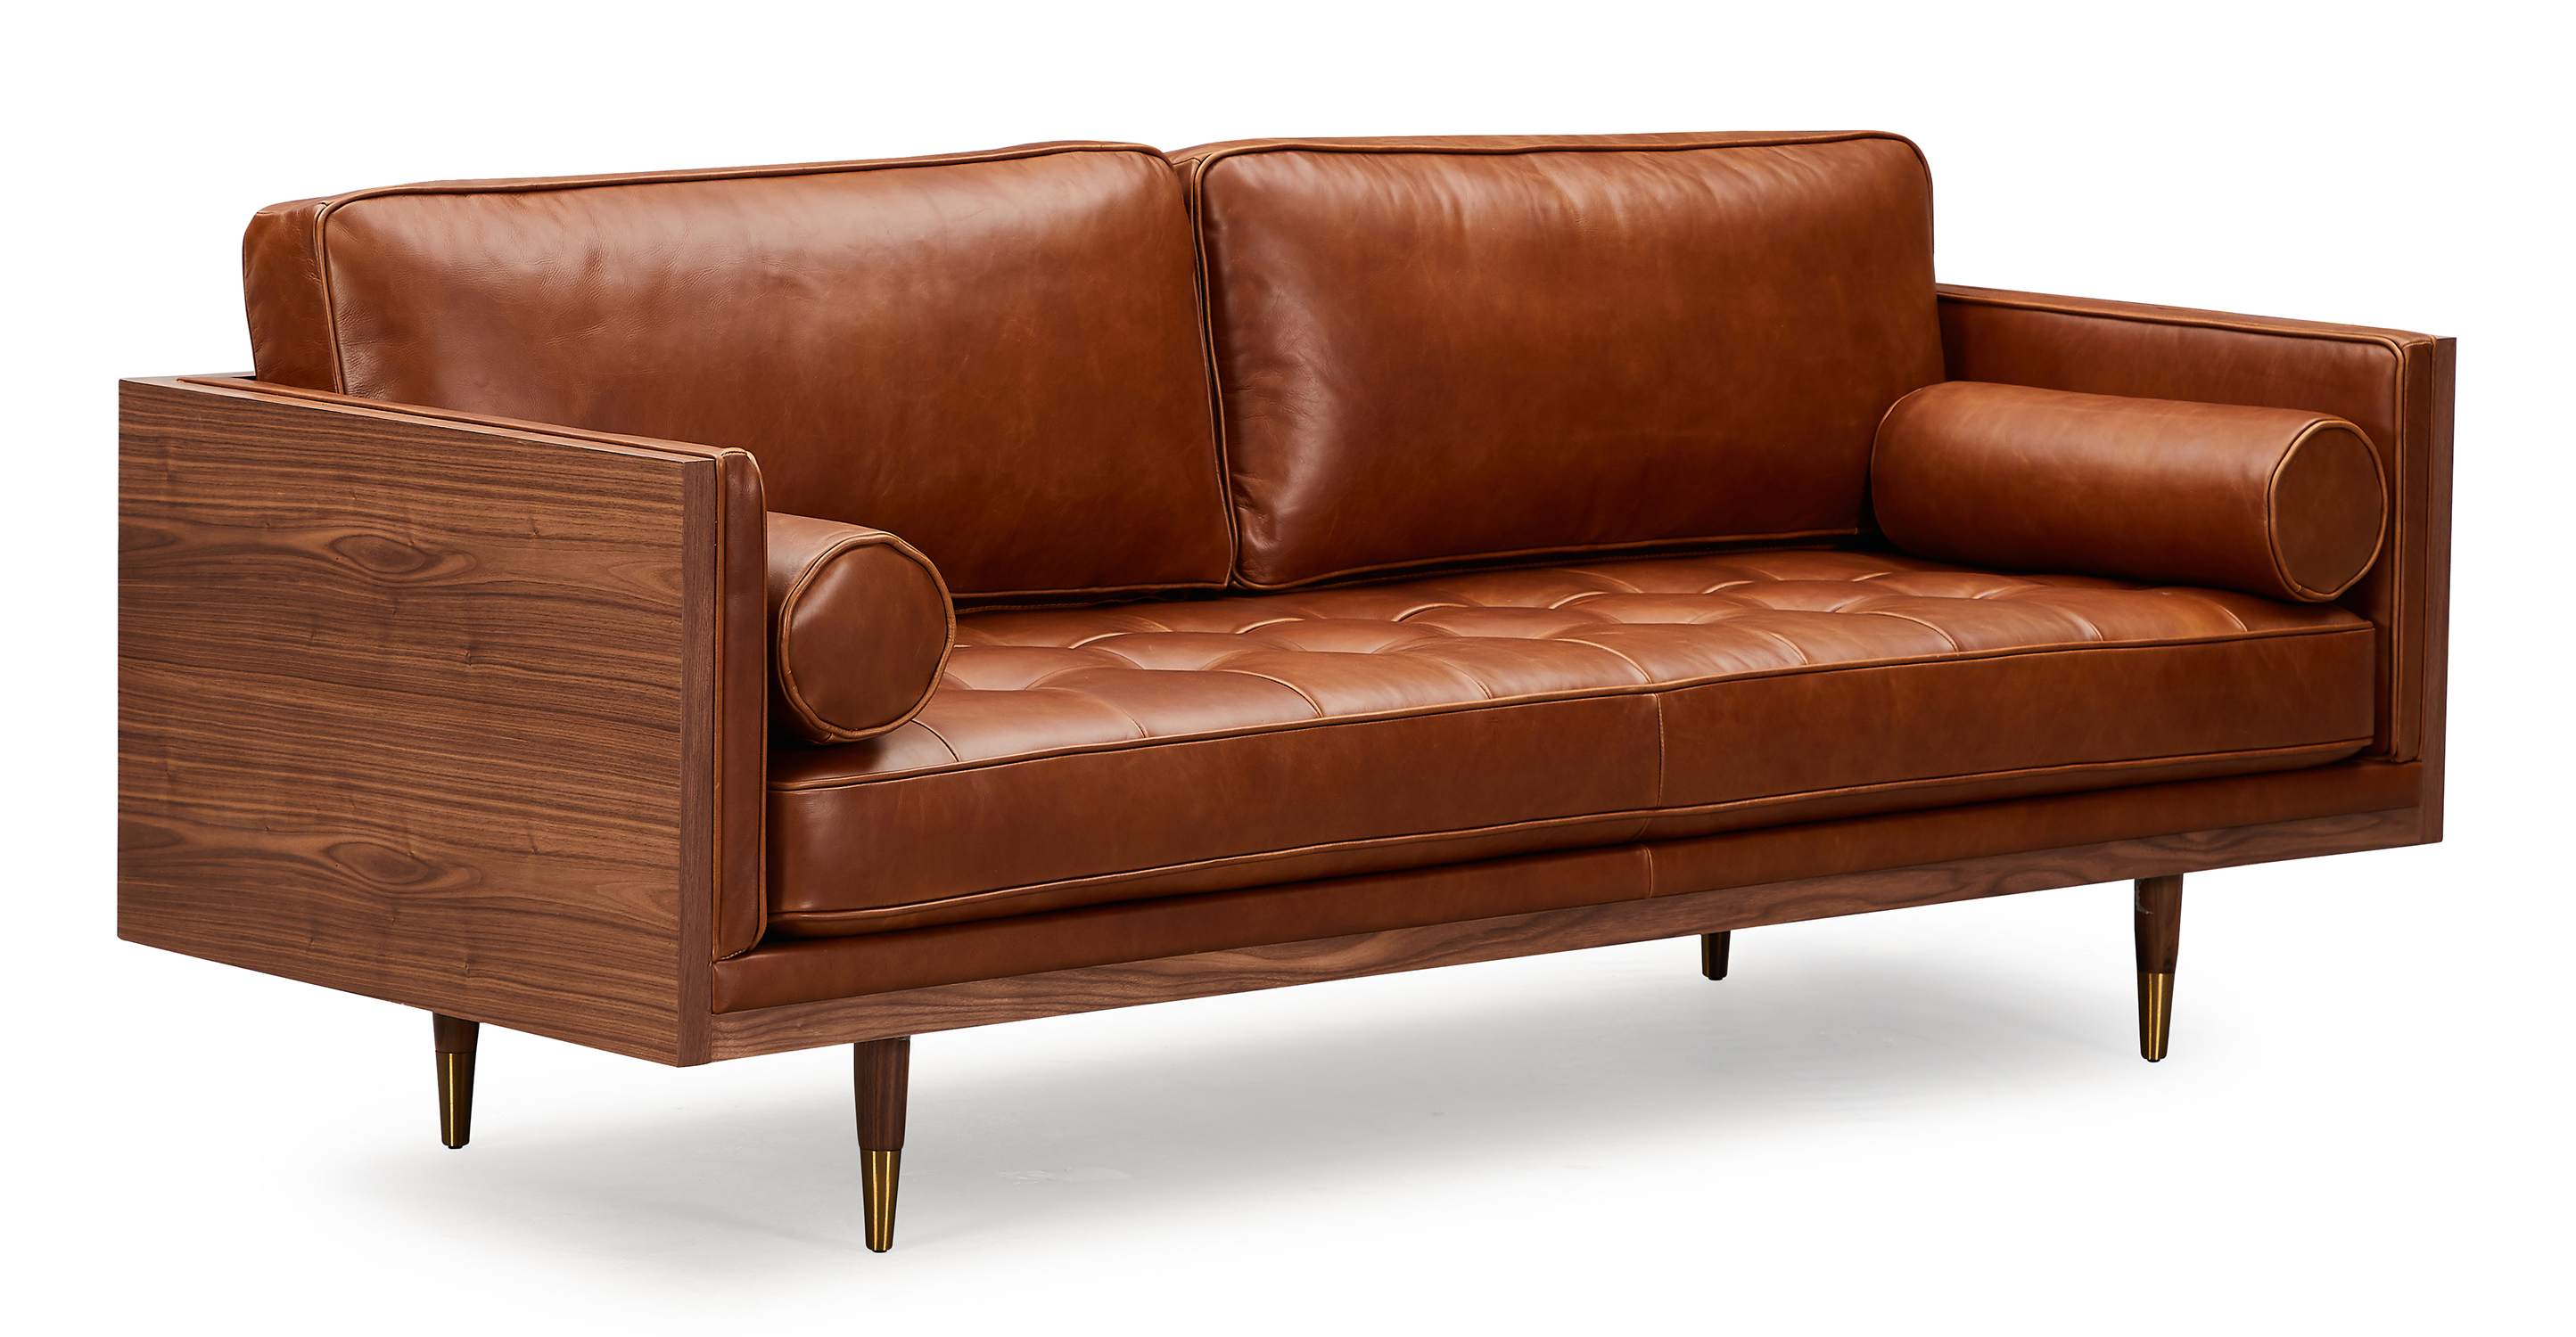 "Woodrow Skandi 87"" Leather Sofa, Walnut/Saddle Brown"